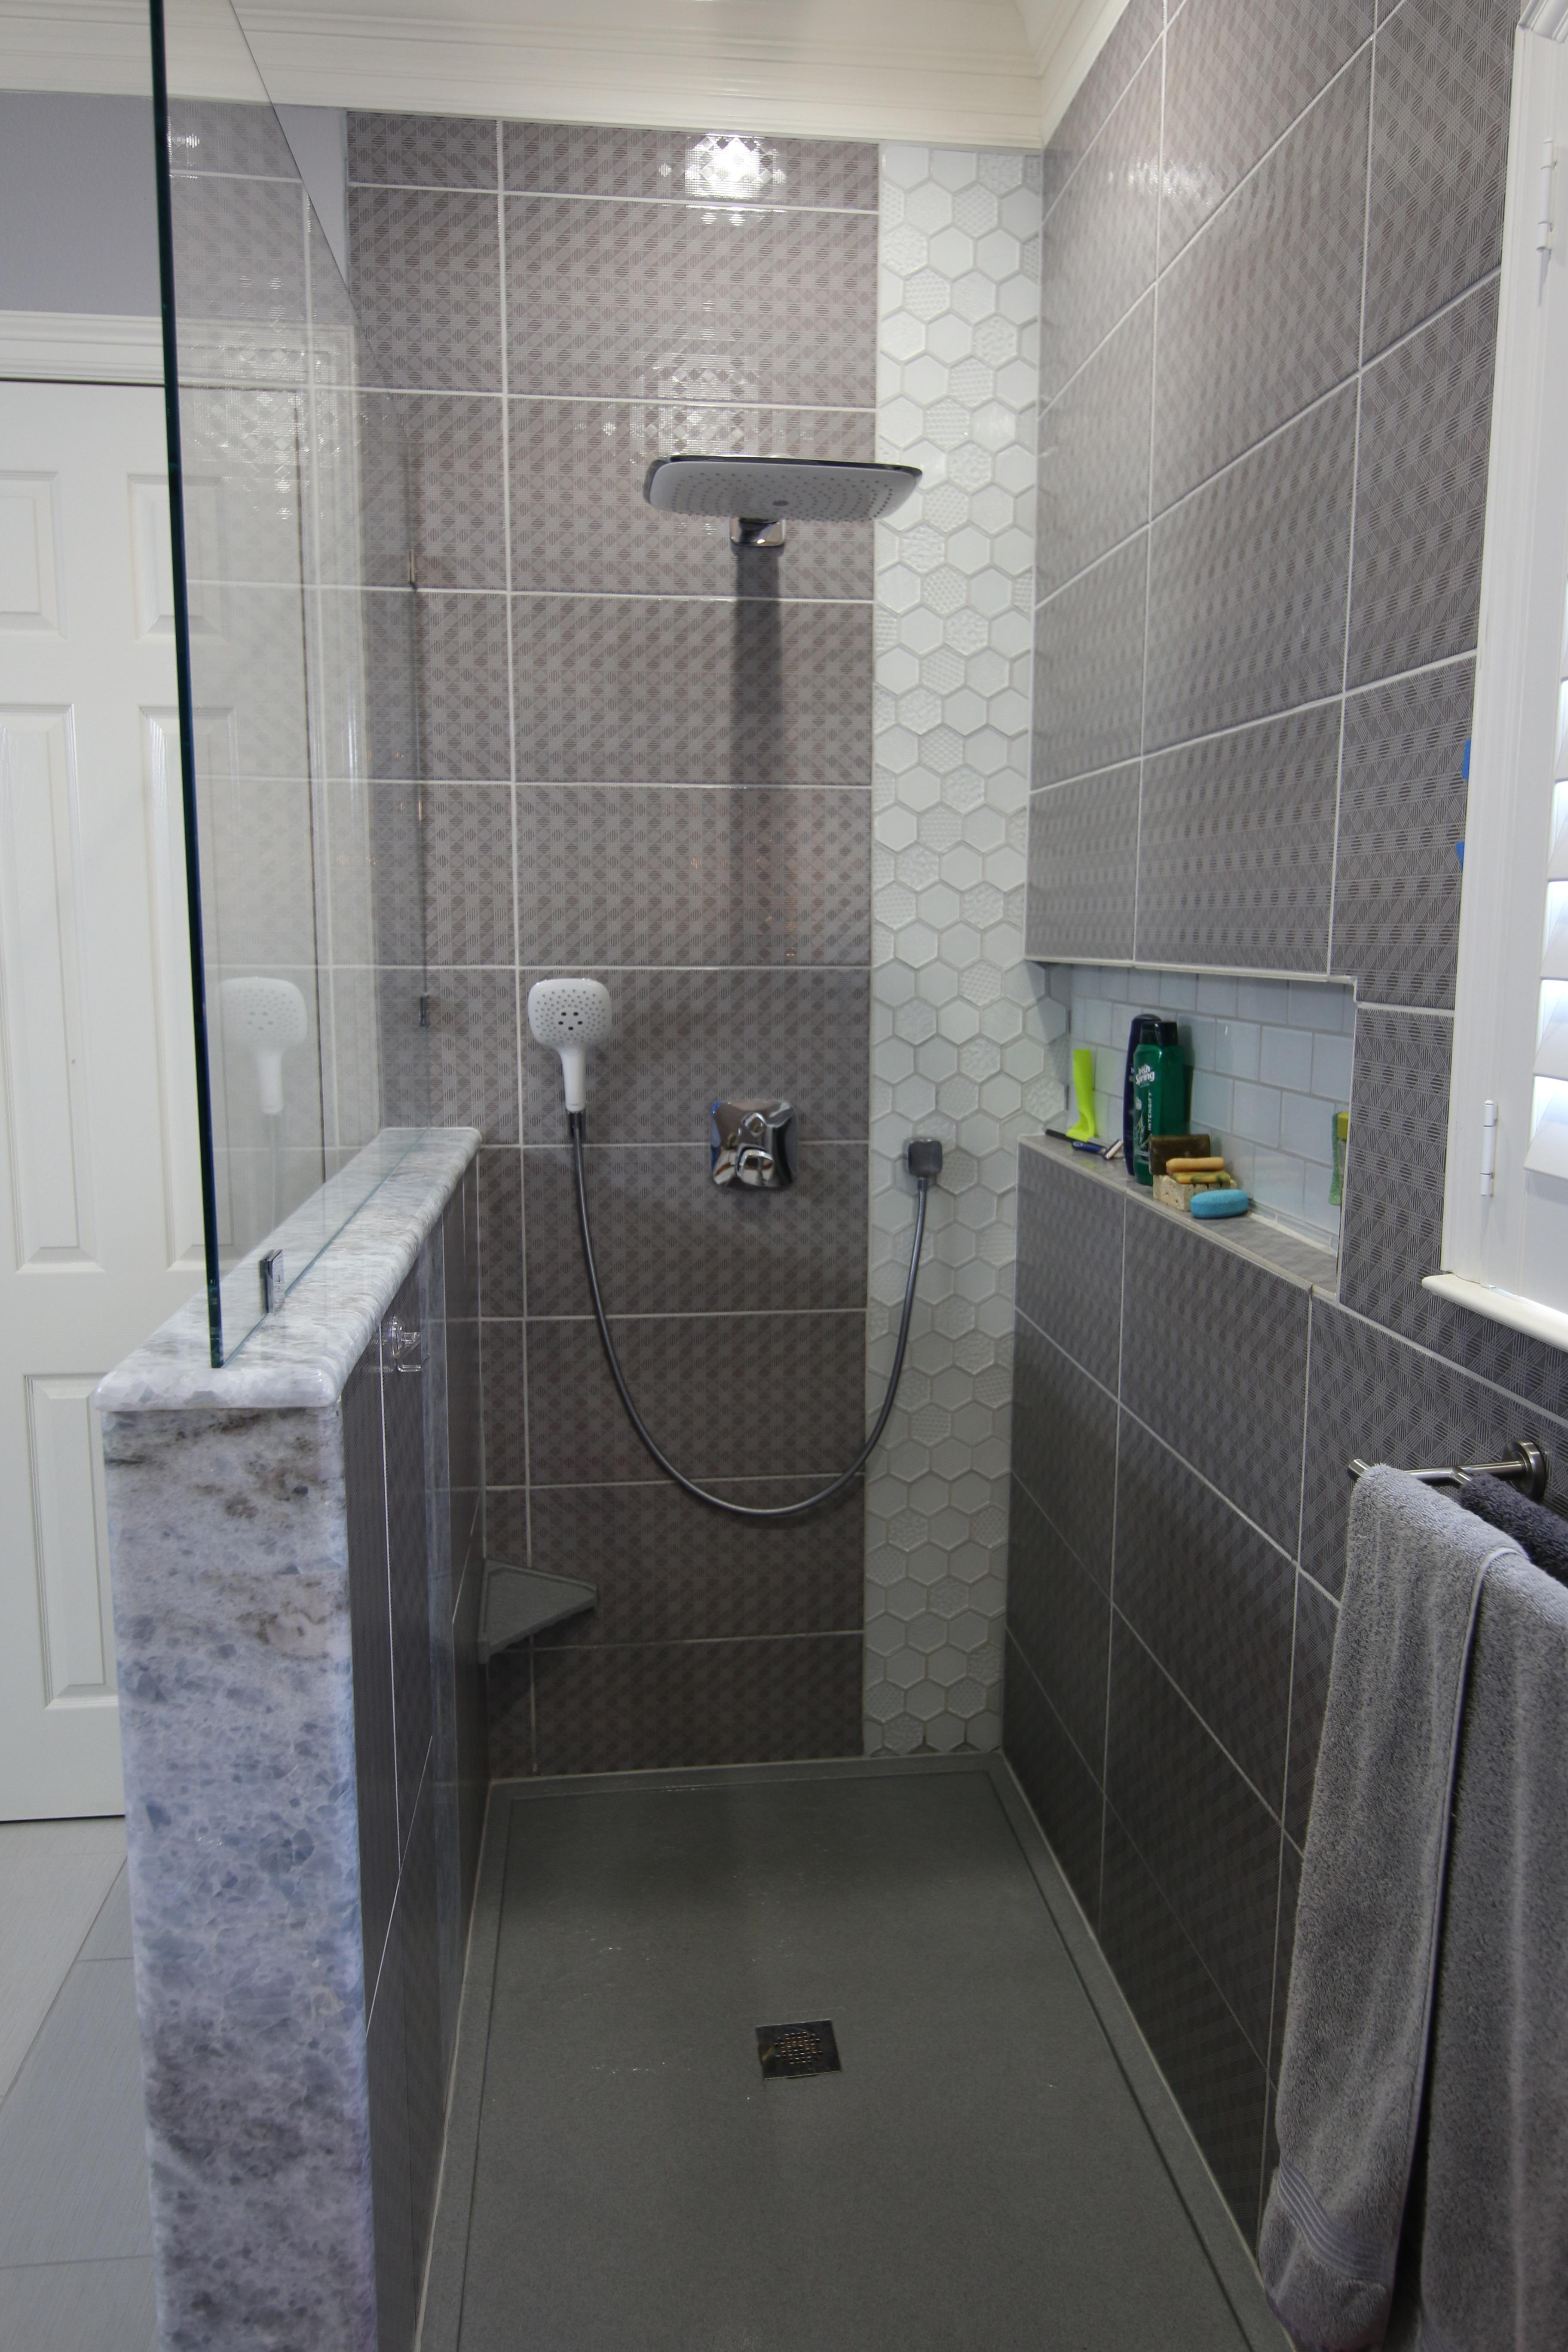 Bathroom Remodeling Austin bathroom remodeling austin, texas